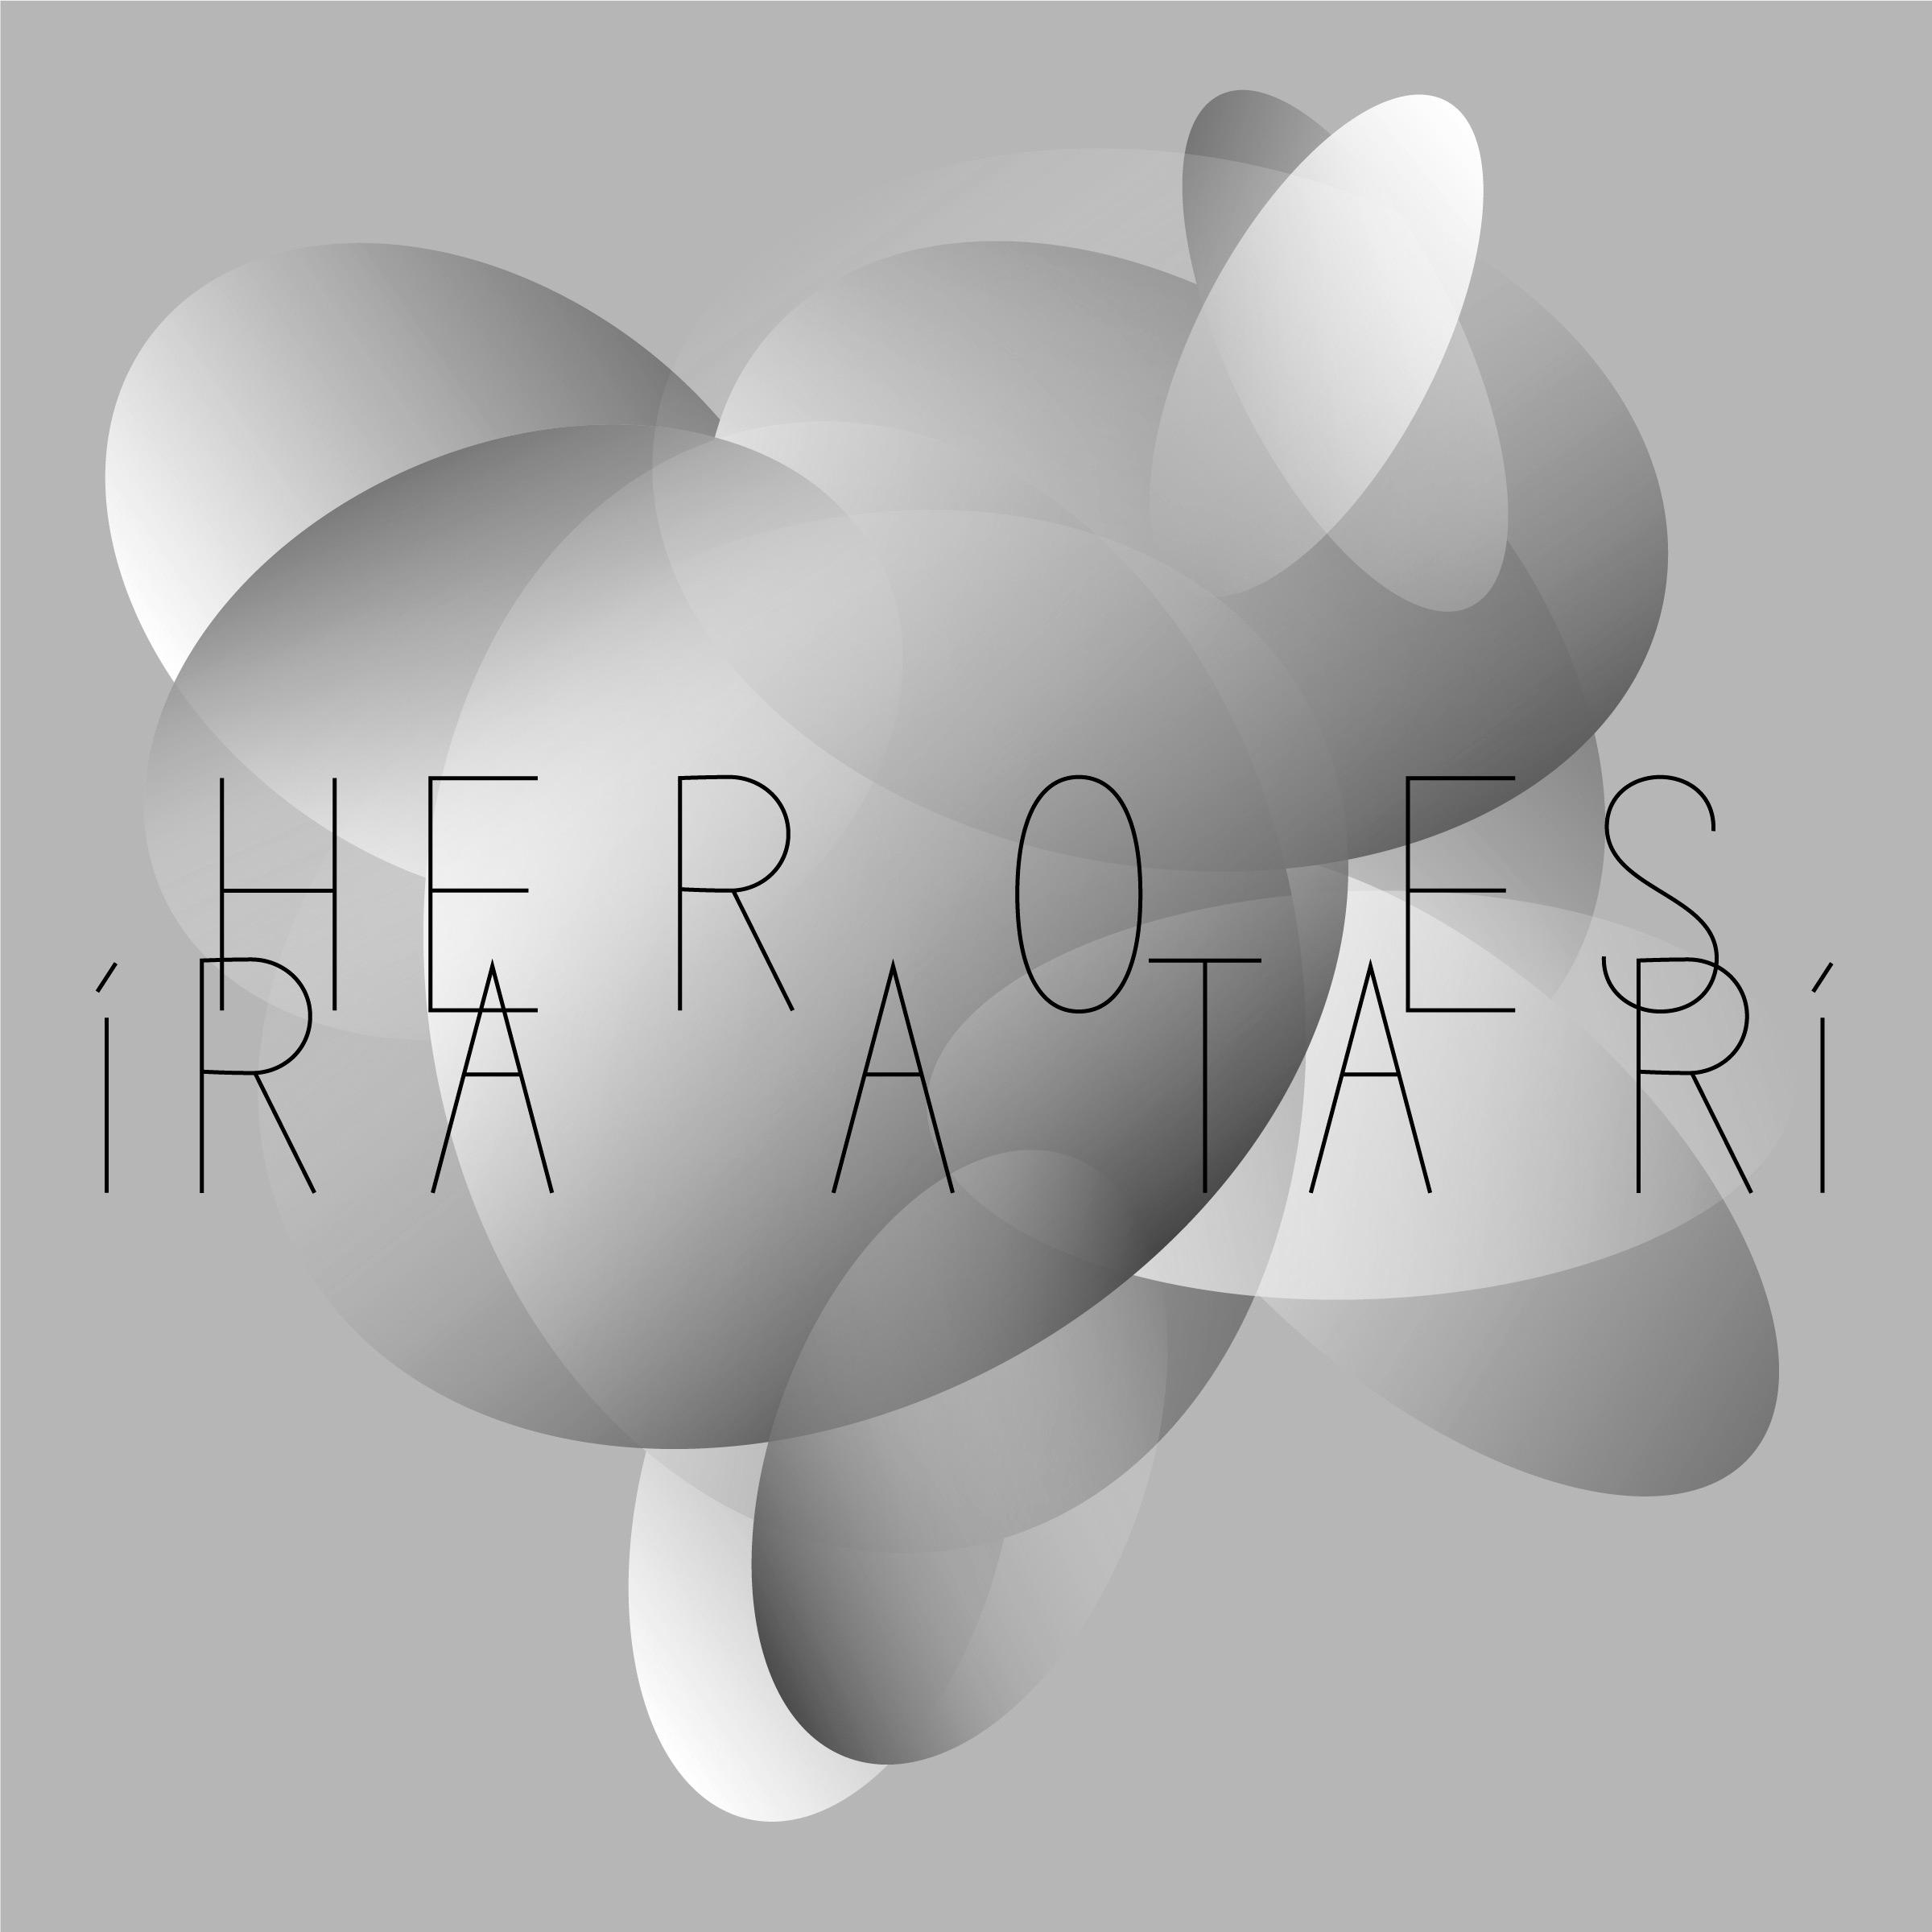 ira-atari-heroes